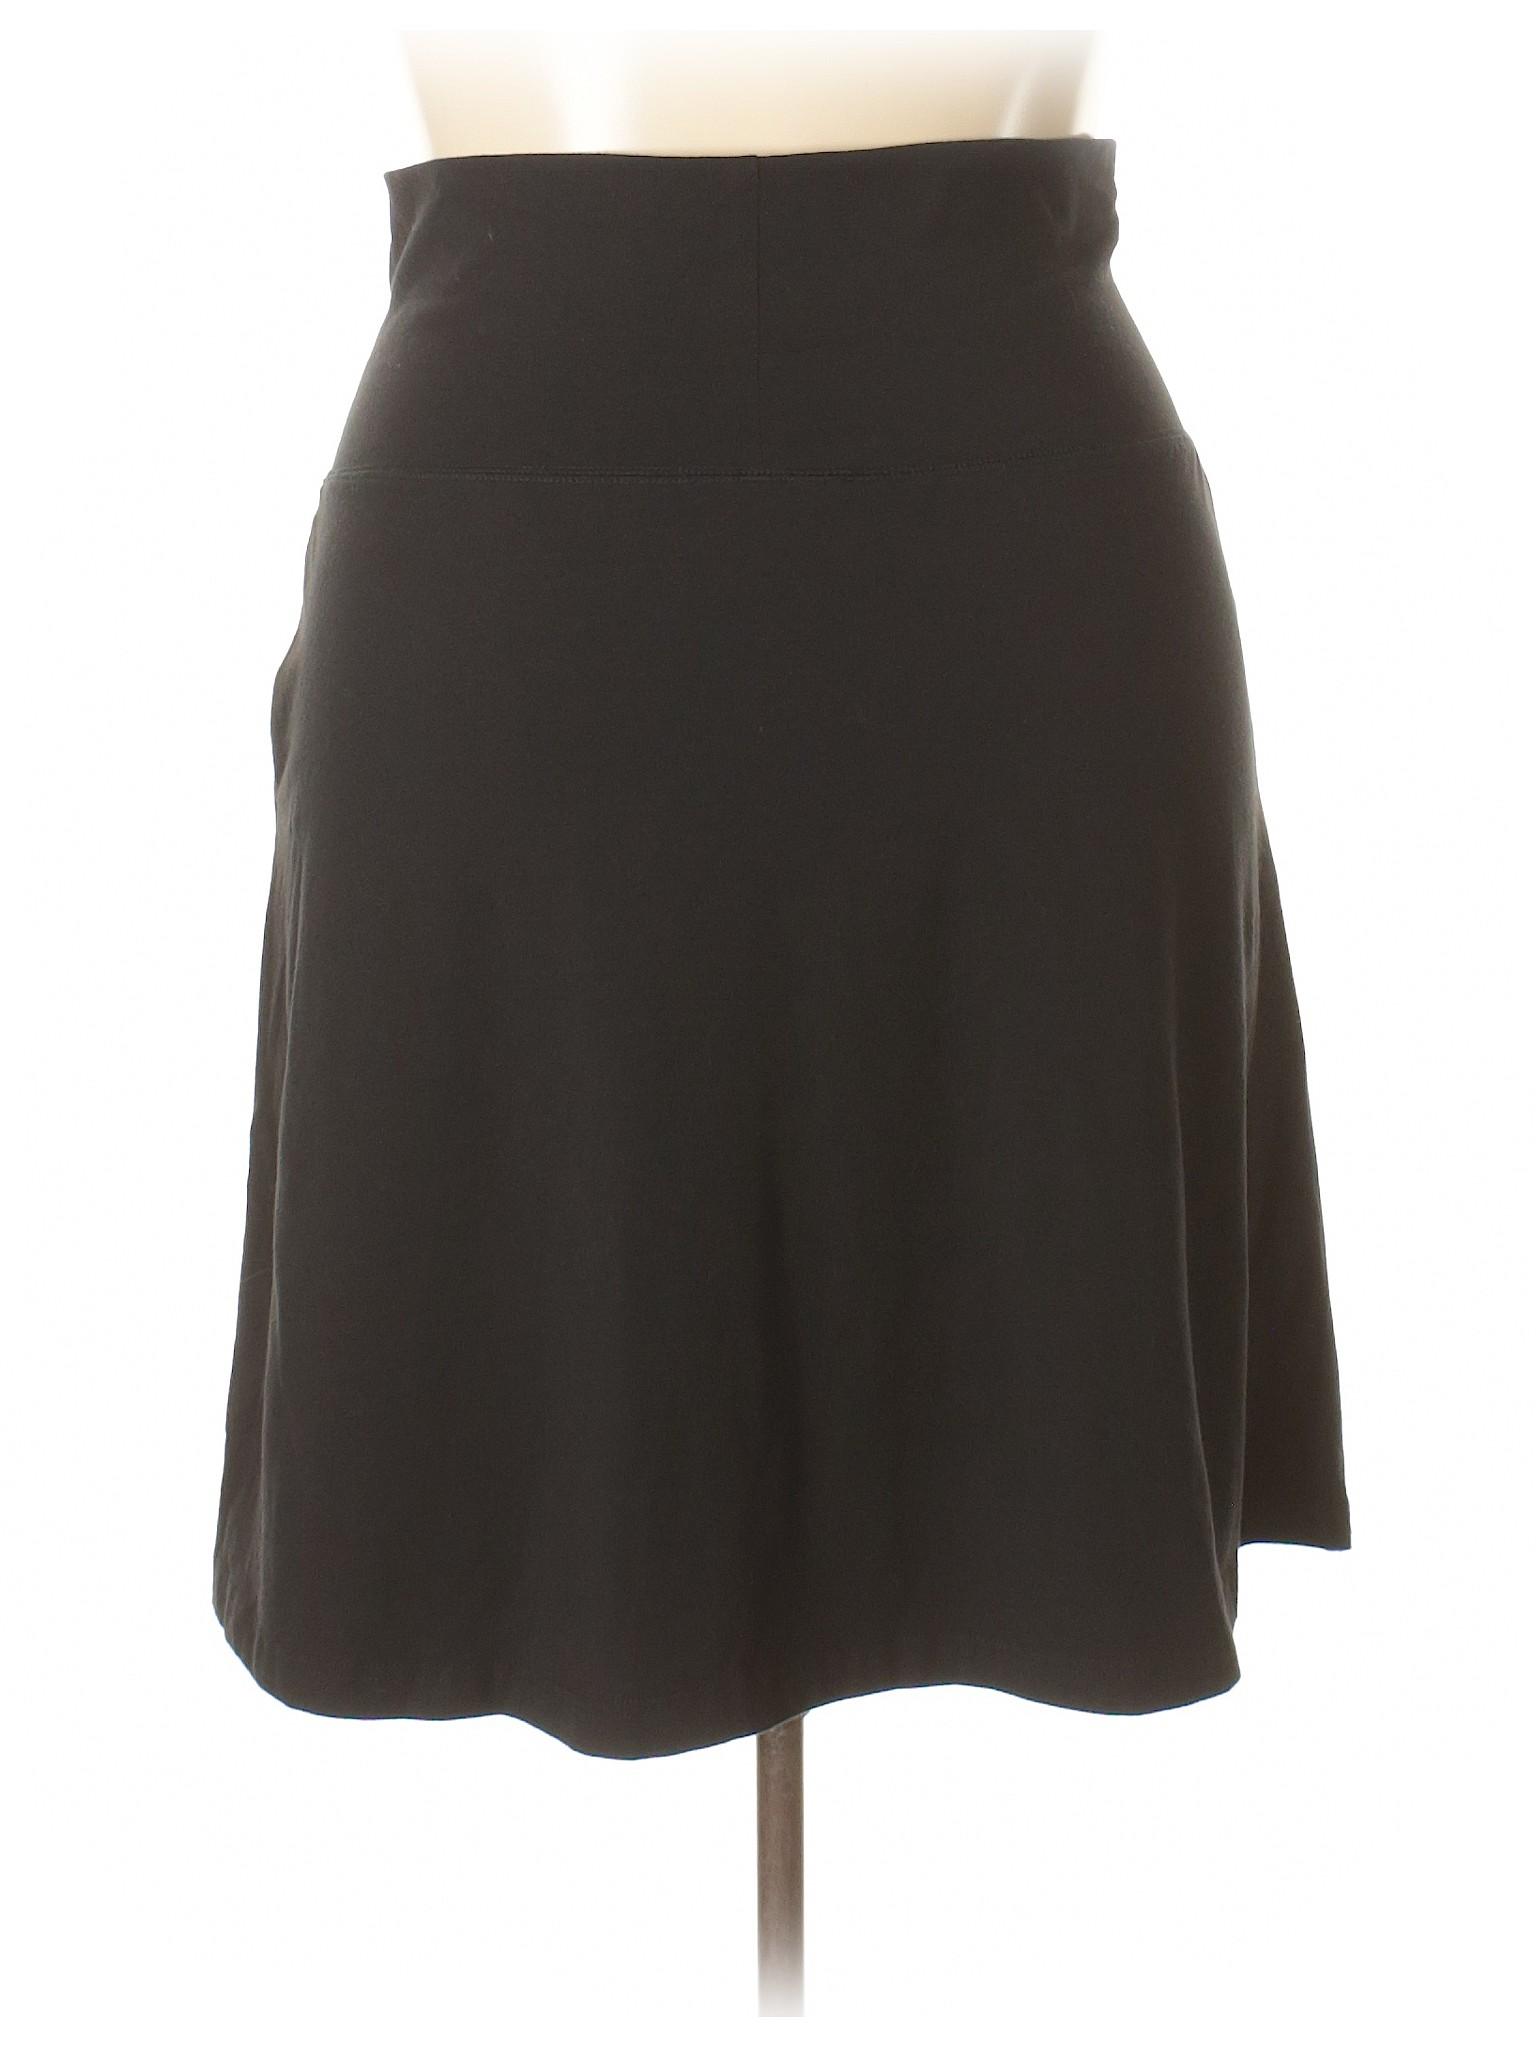 Boutique Skirt Klein Calvin leisure Casual wwaXABq